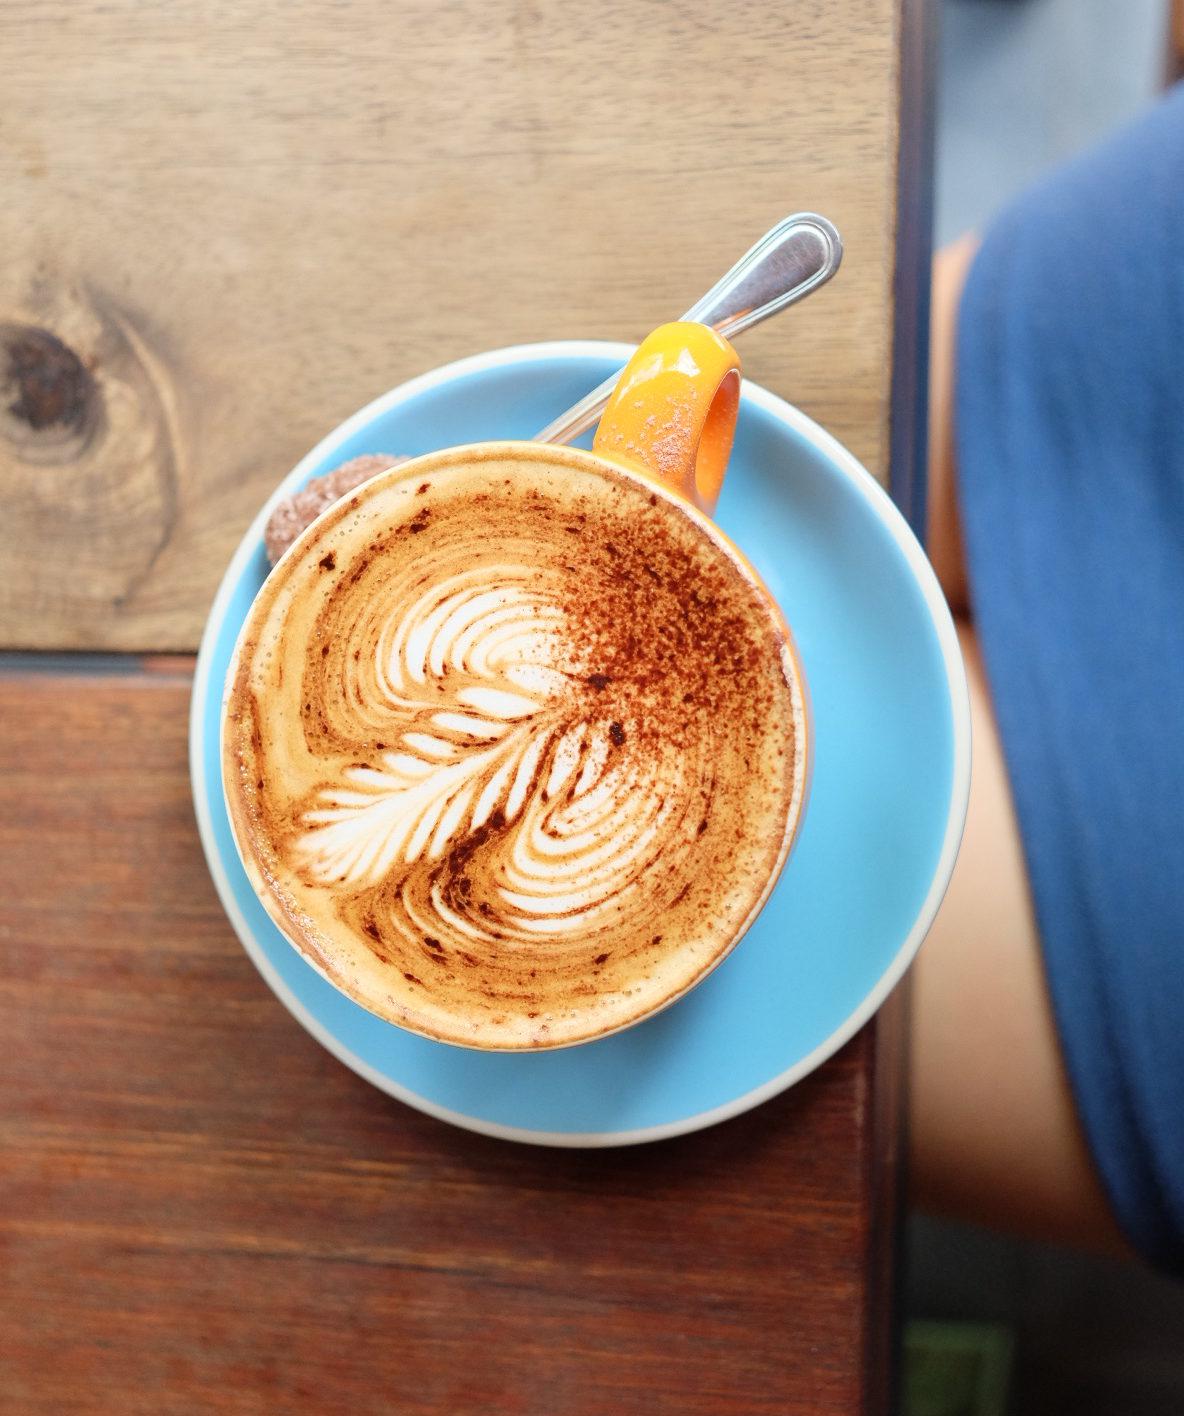 cappuccino, milk and made berawa bali, eten in berawa